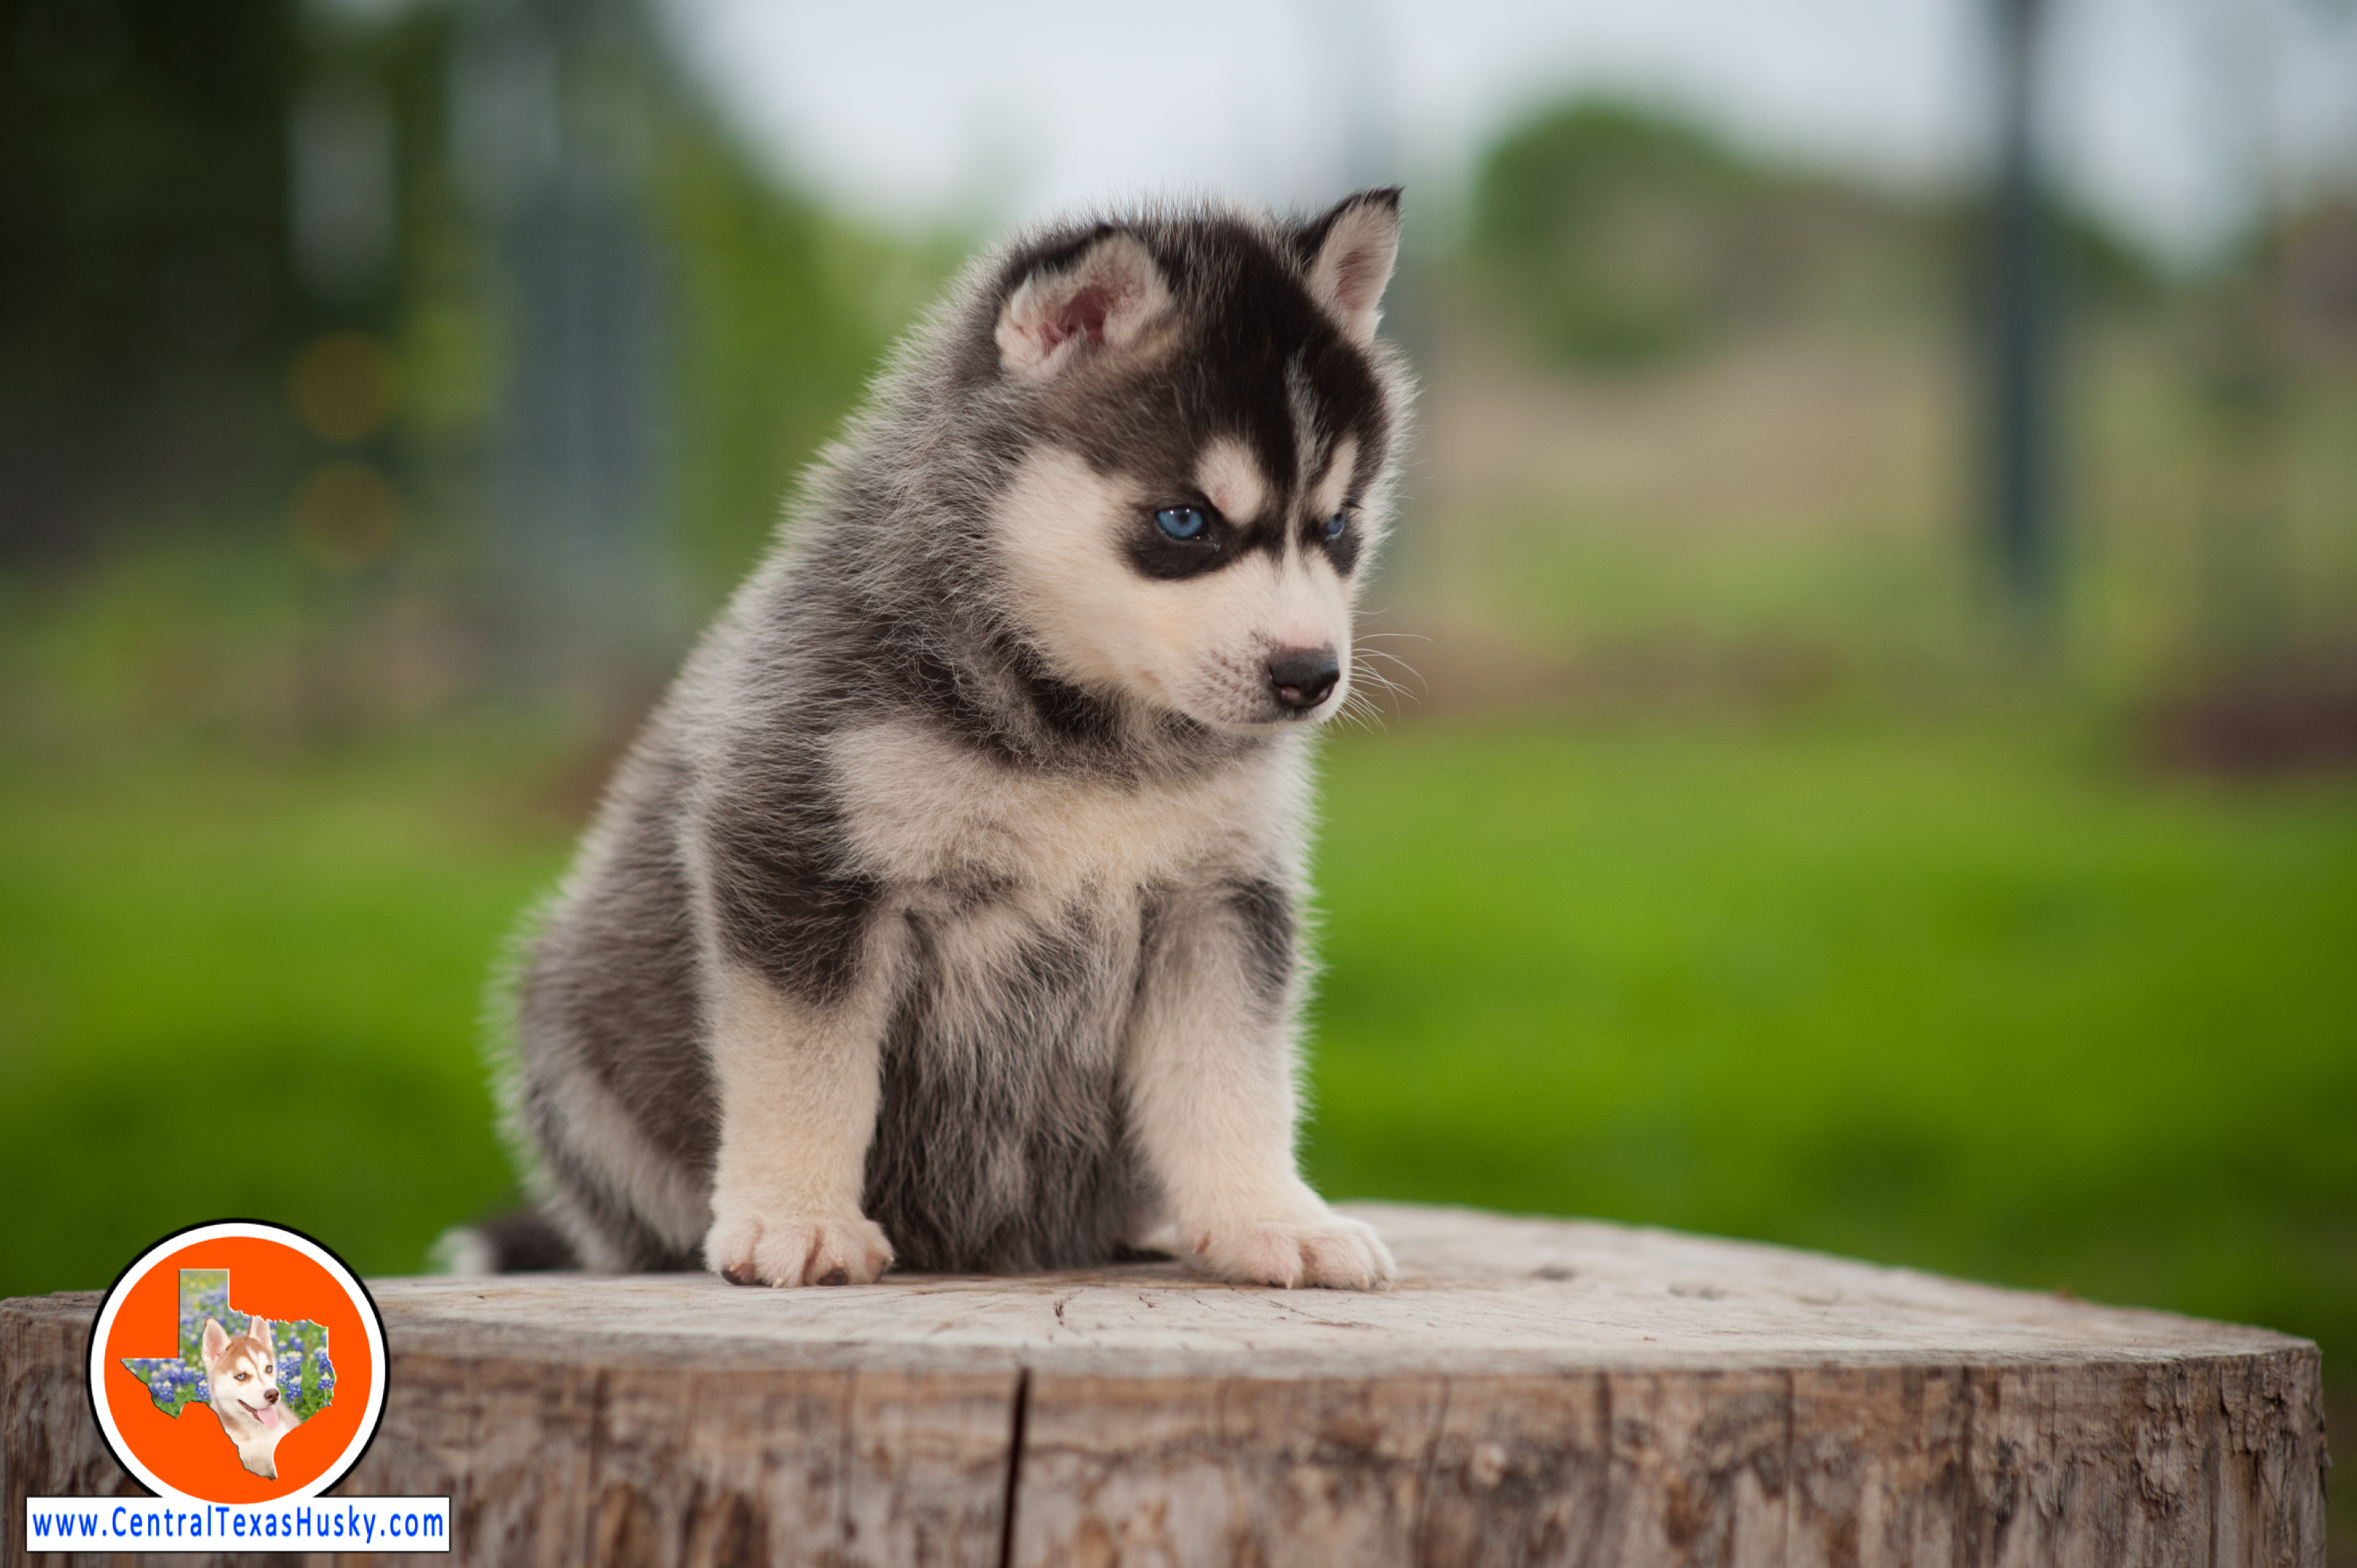 central-texas-husky_austin-siberian-husky-breeder_703959_20180324